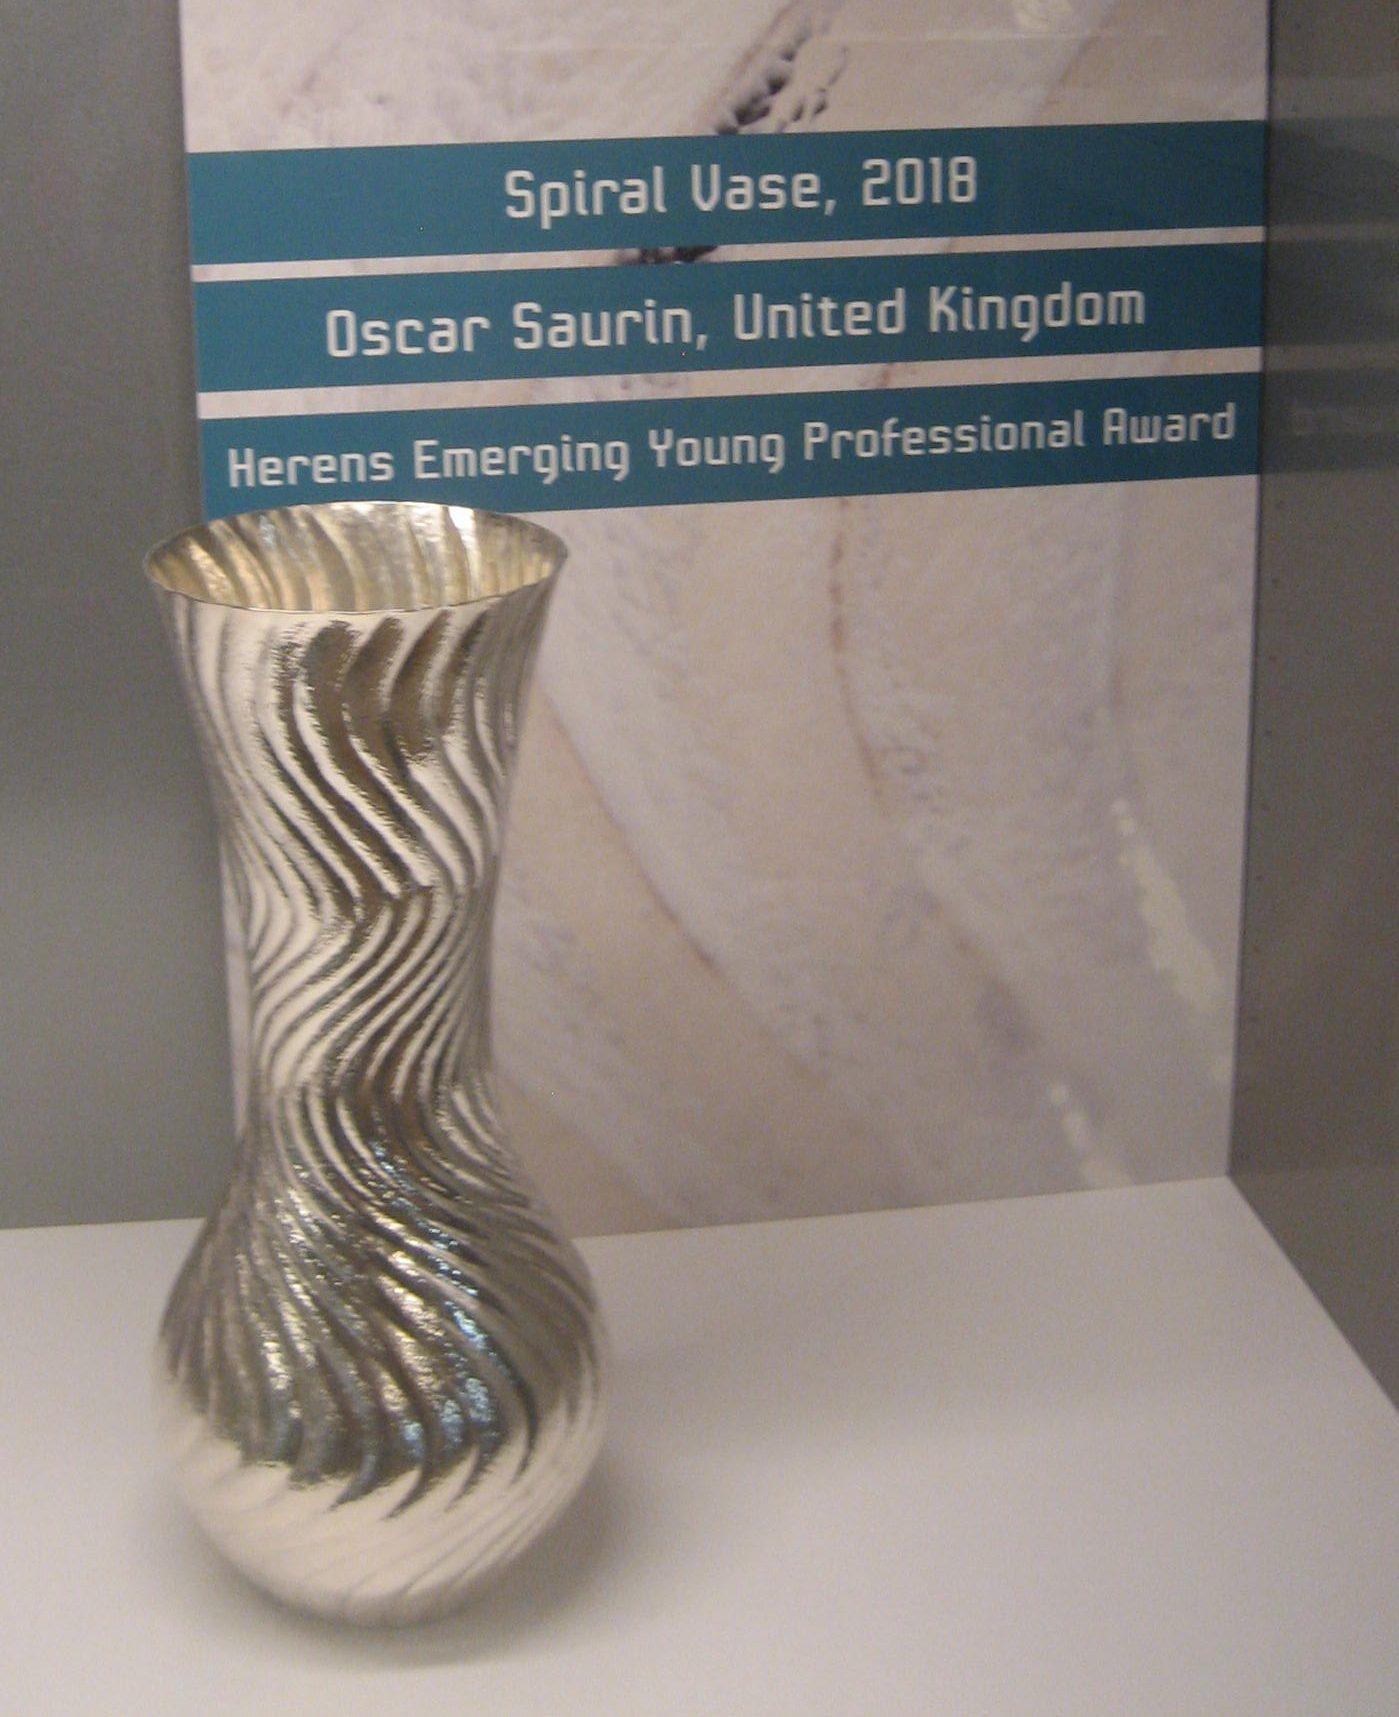 Oscar Saurin, Spiral Vase, 2018. Foto Esther Doornbusch, 29 maart 2019, CC BY 4.0